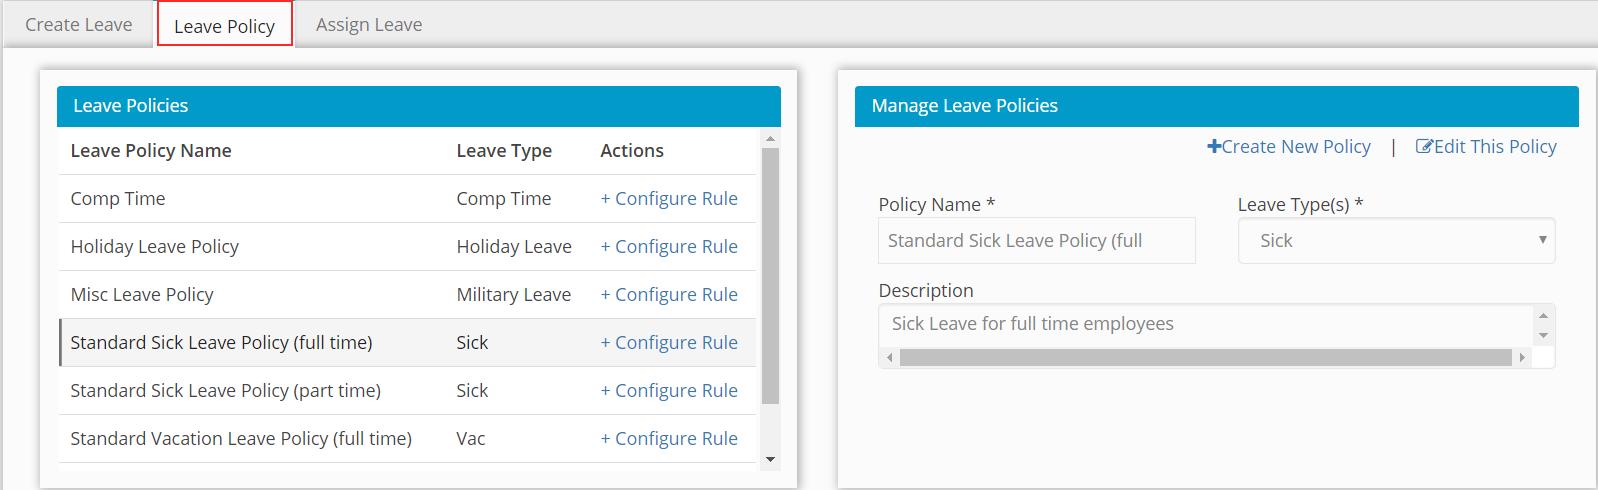 Create Leave Policy by Hour Timesheet screenshot